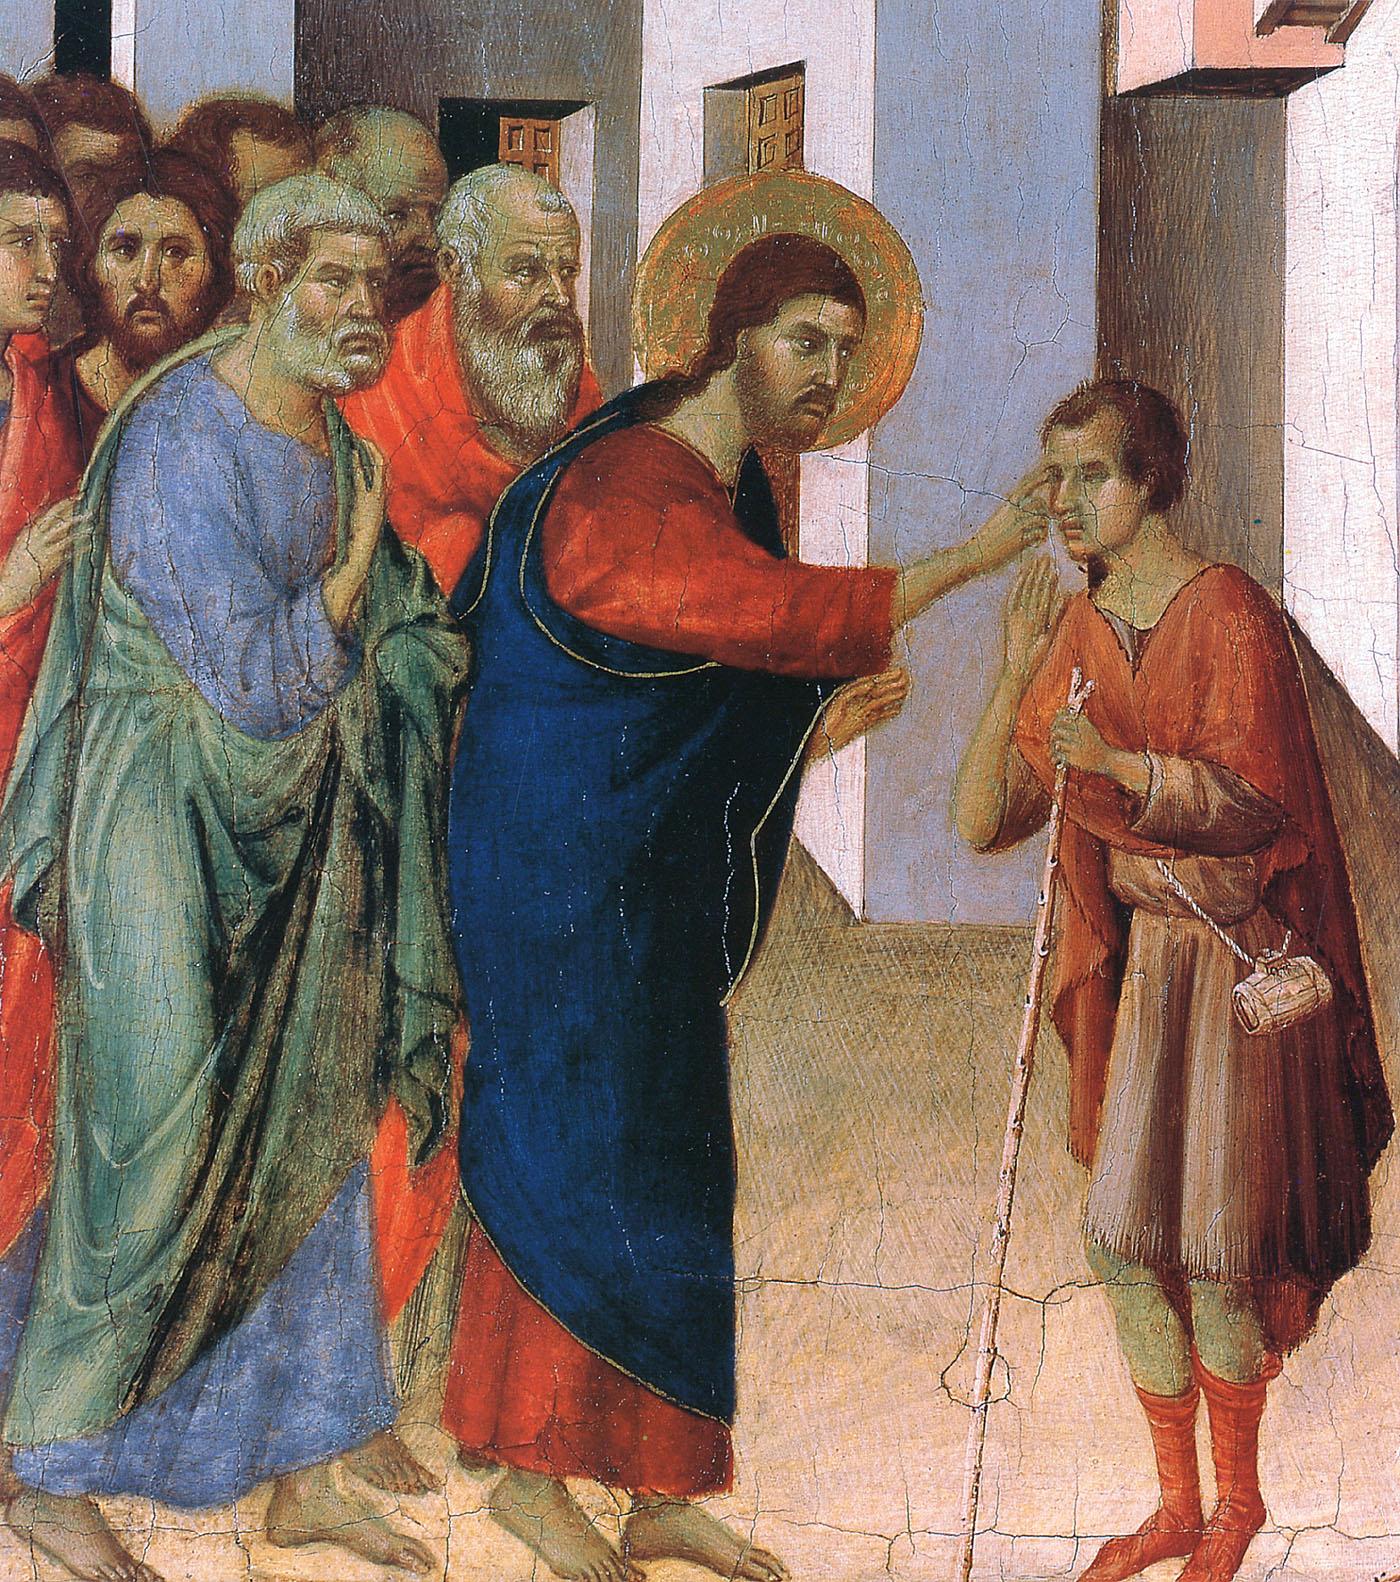 Jesus Heals the Man Born Blind - 1308